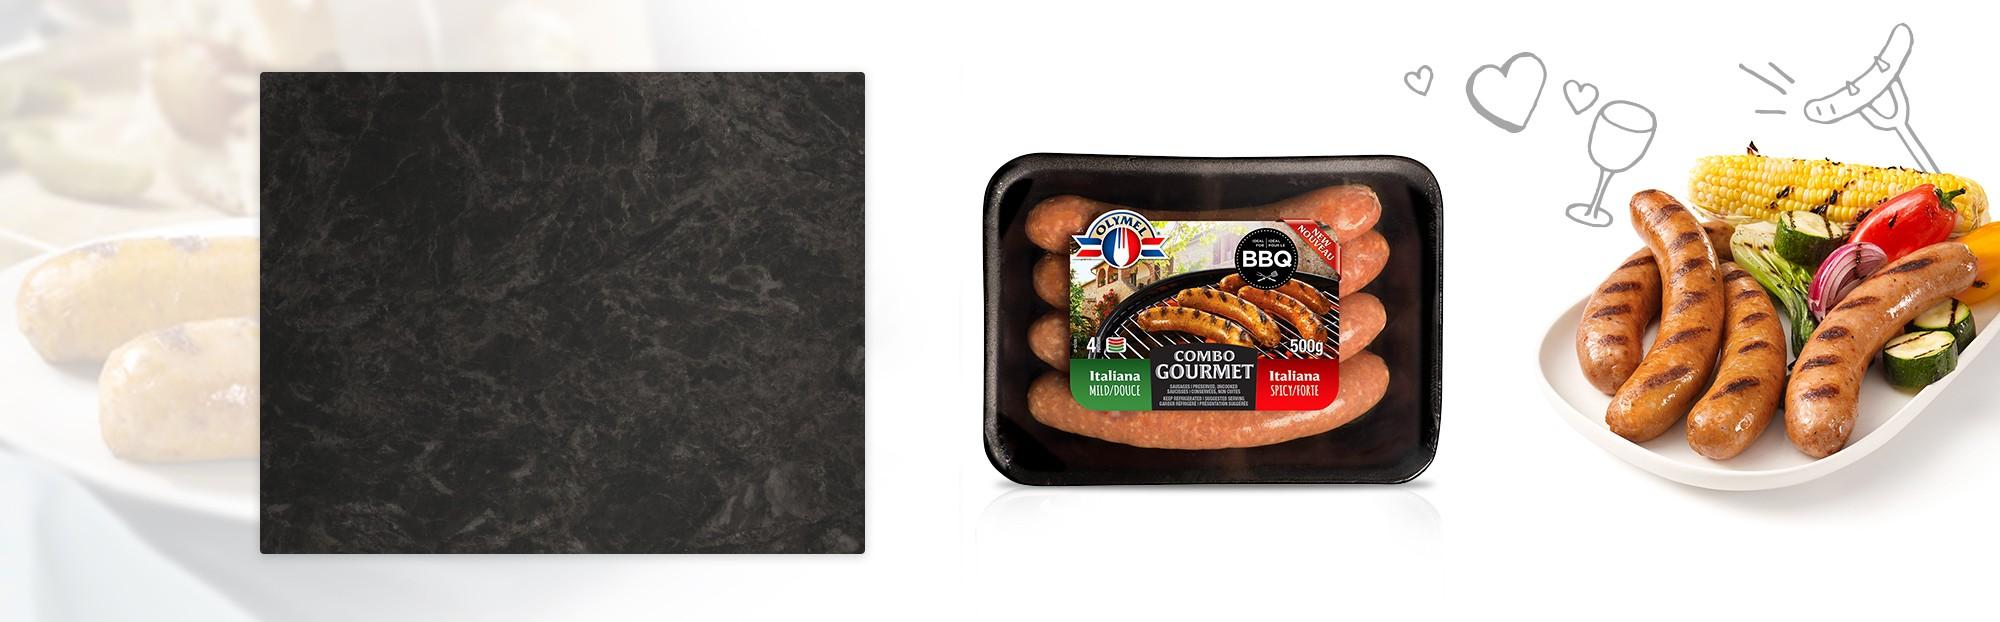 Duo saucisses Italienne douce et forte Olymel gourmet